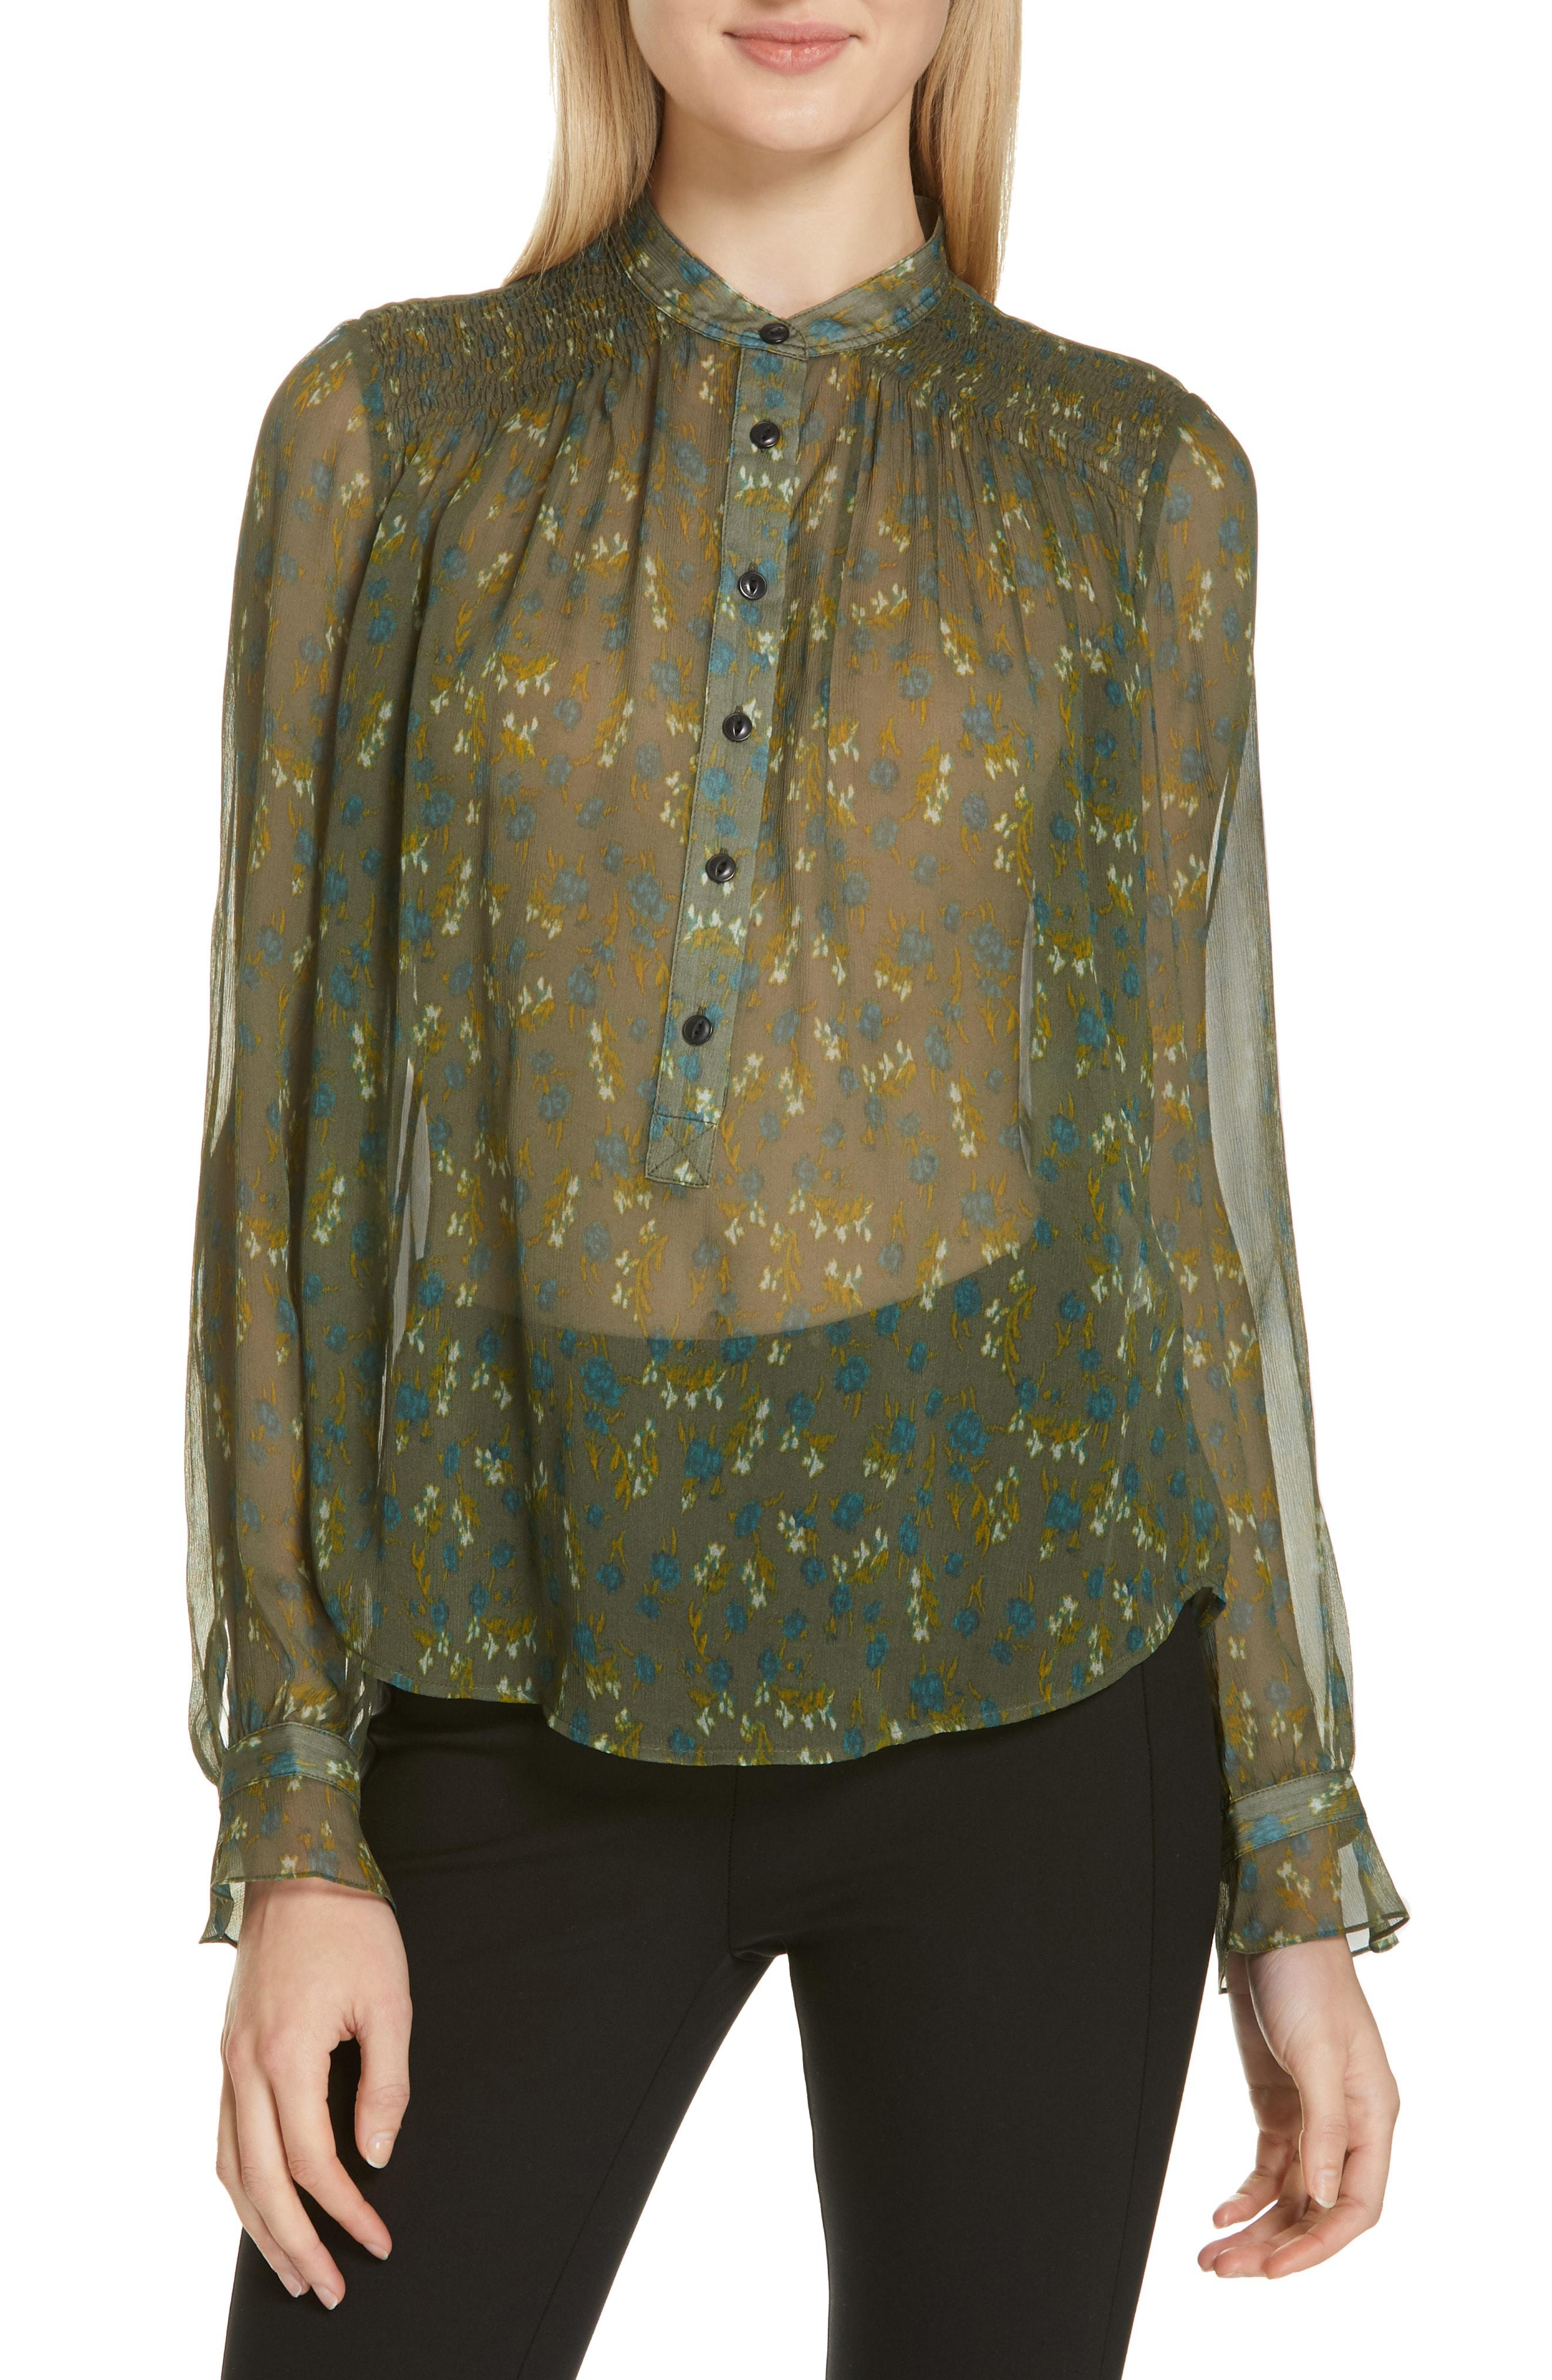 021521eb521ea5 Rag   Bone Susan Floral Chiffon Long-Sleeve Blouse In Olive Multi ...